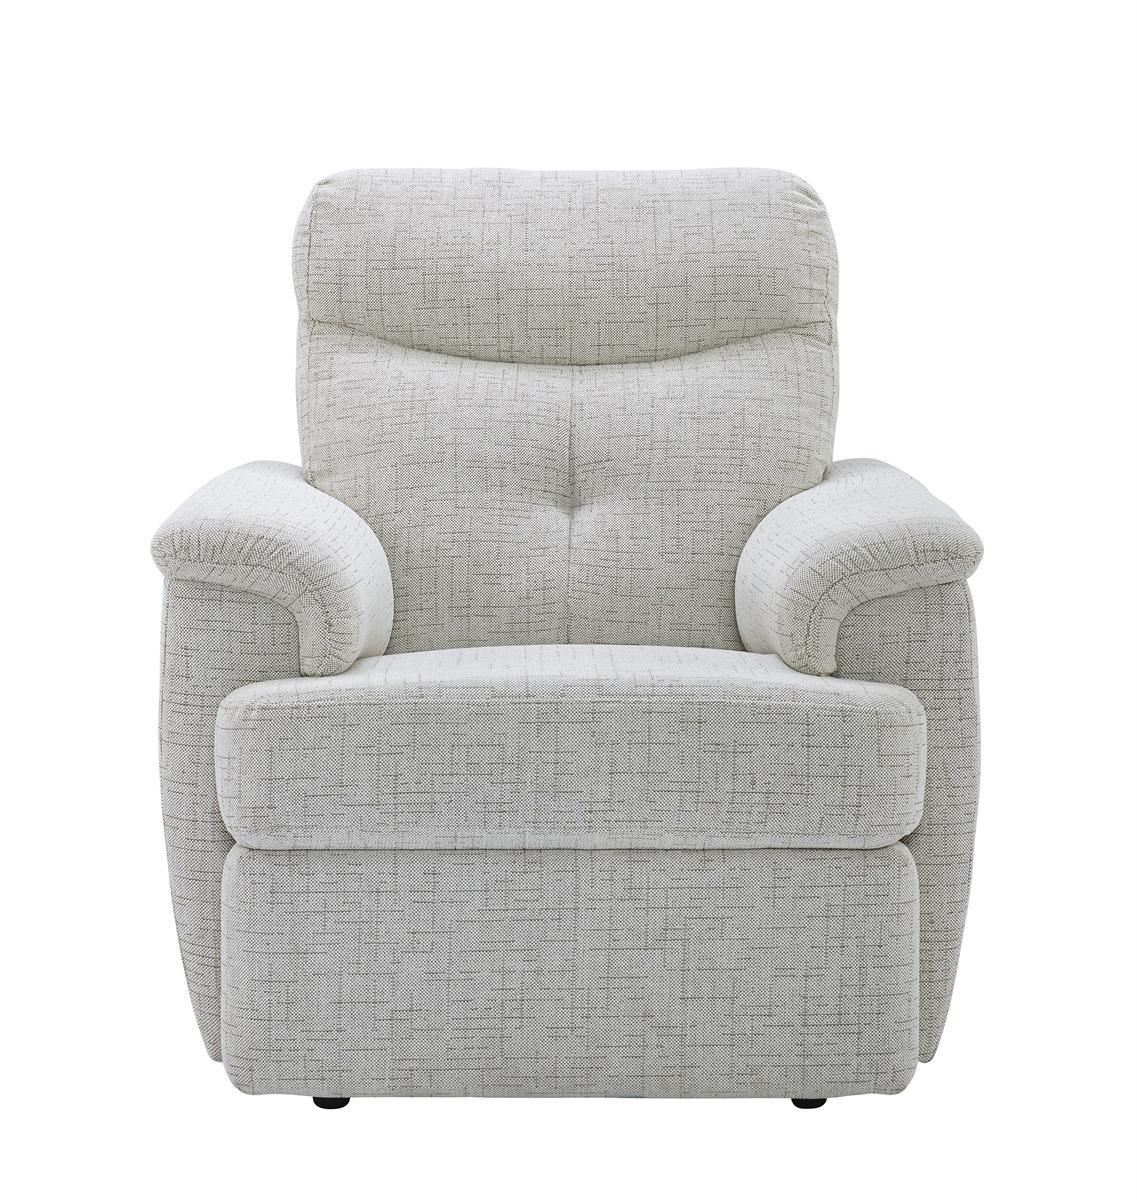 GPlan - Atlanta Arm Chair